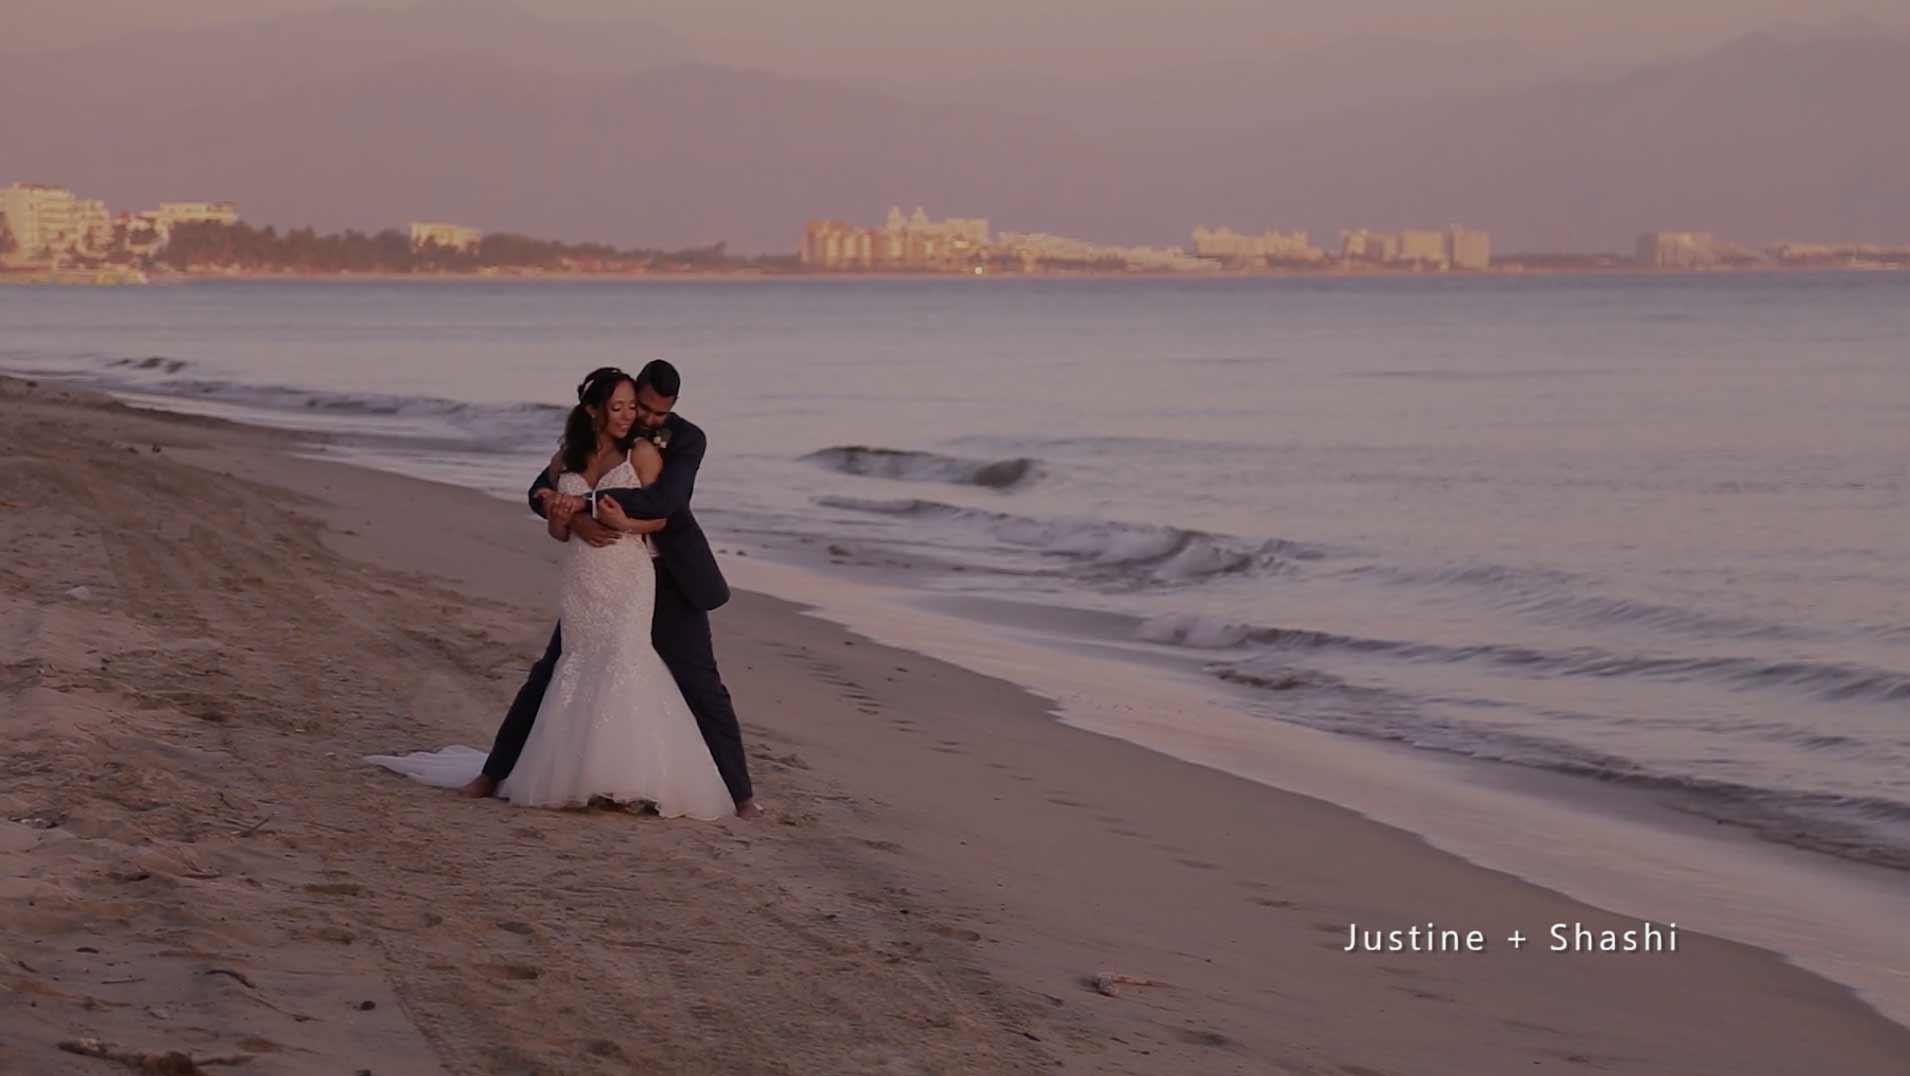 Justine + Shashi